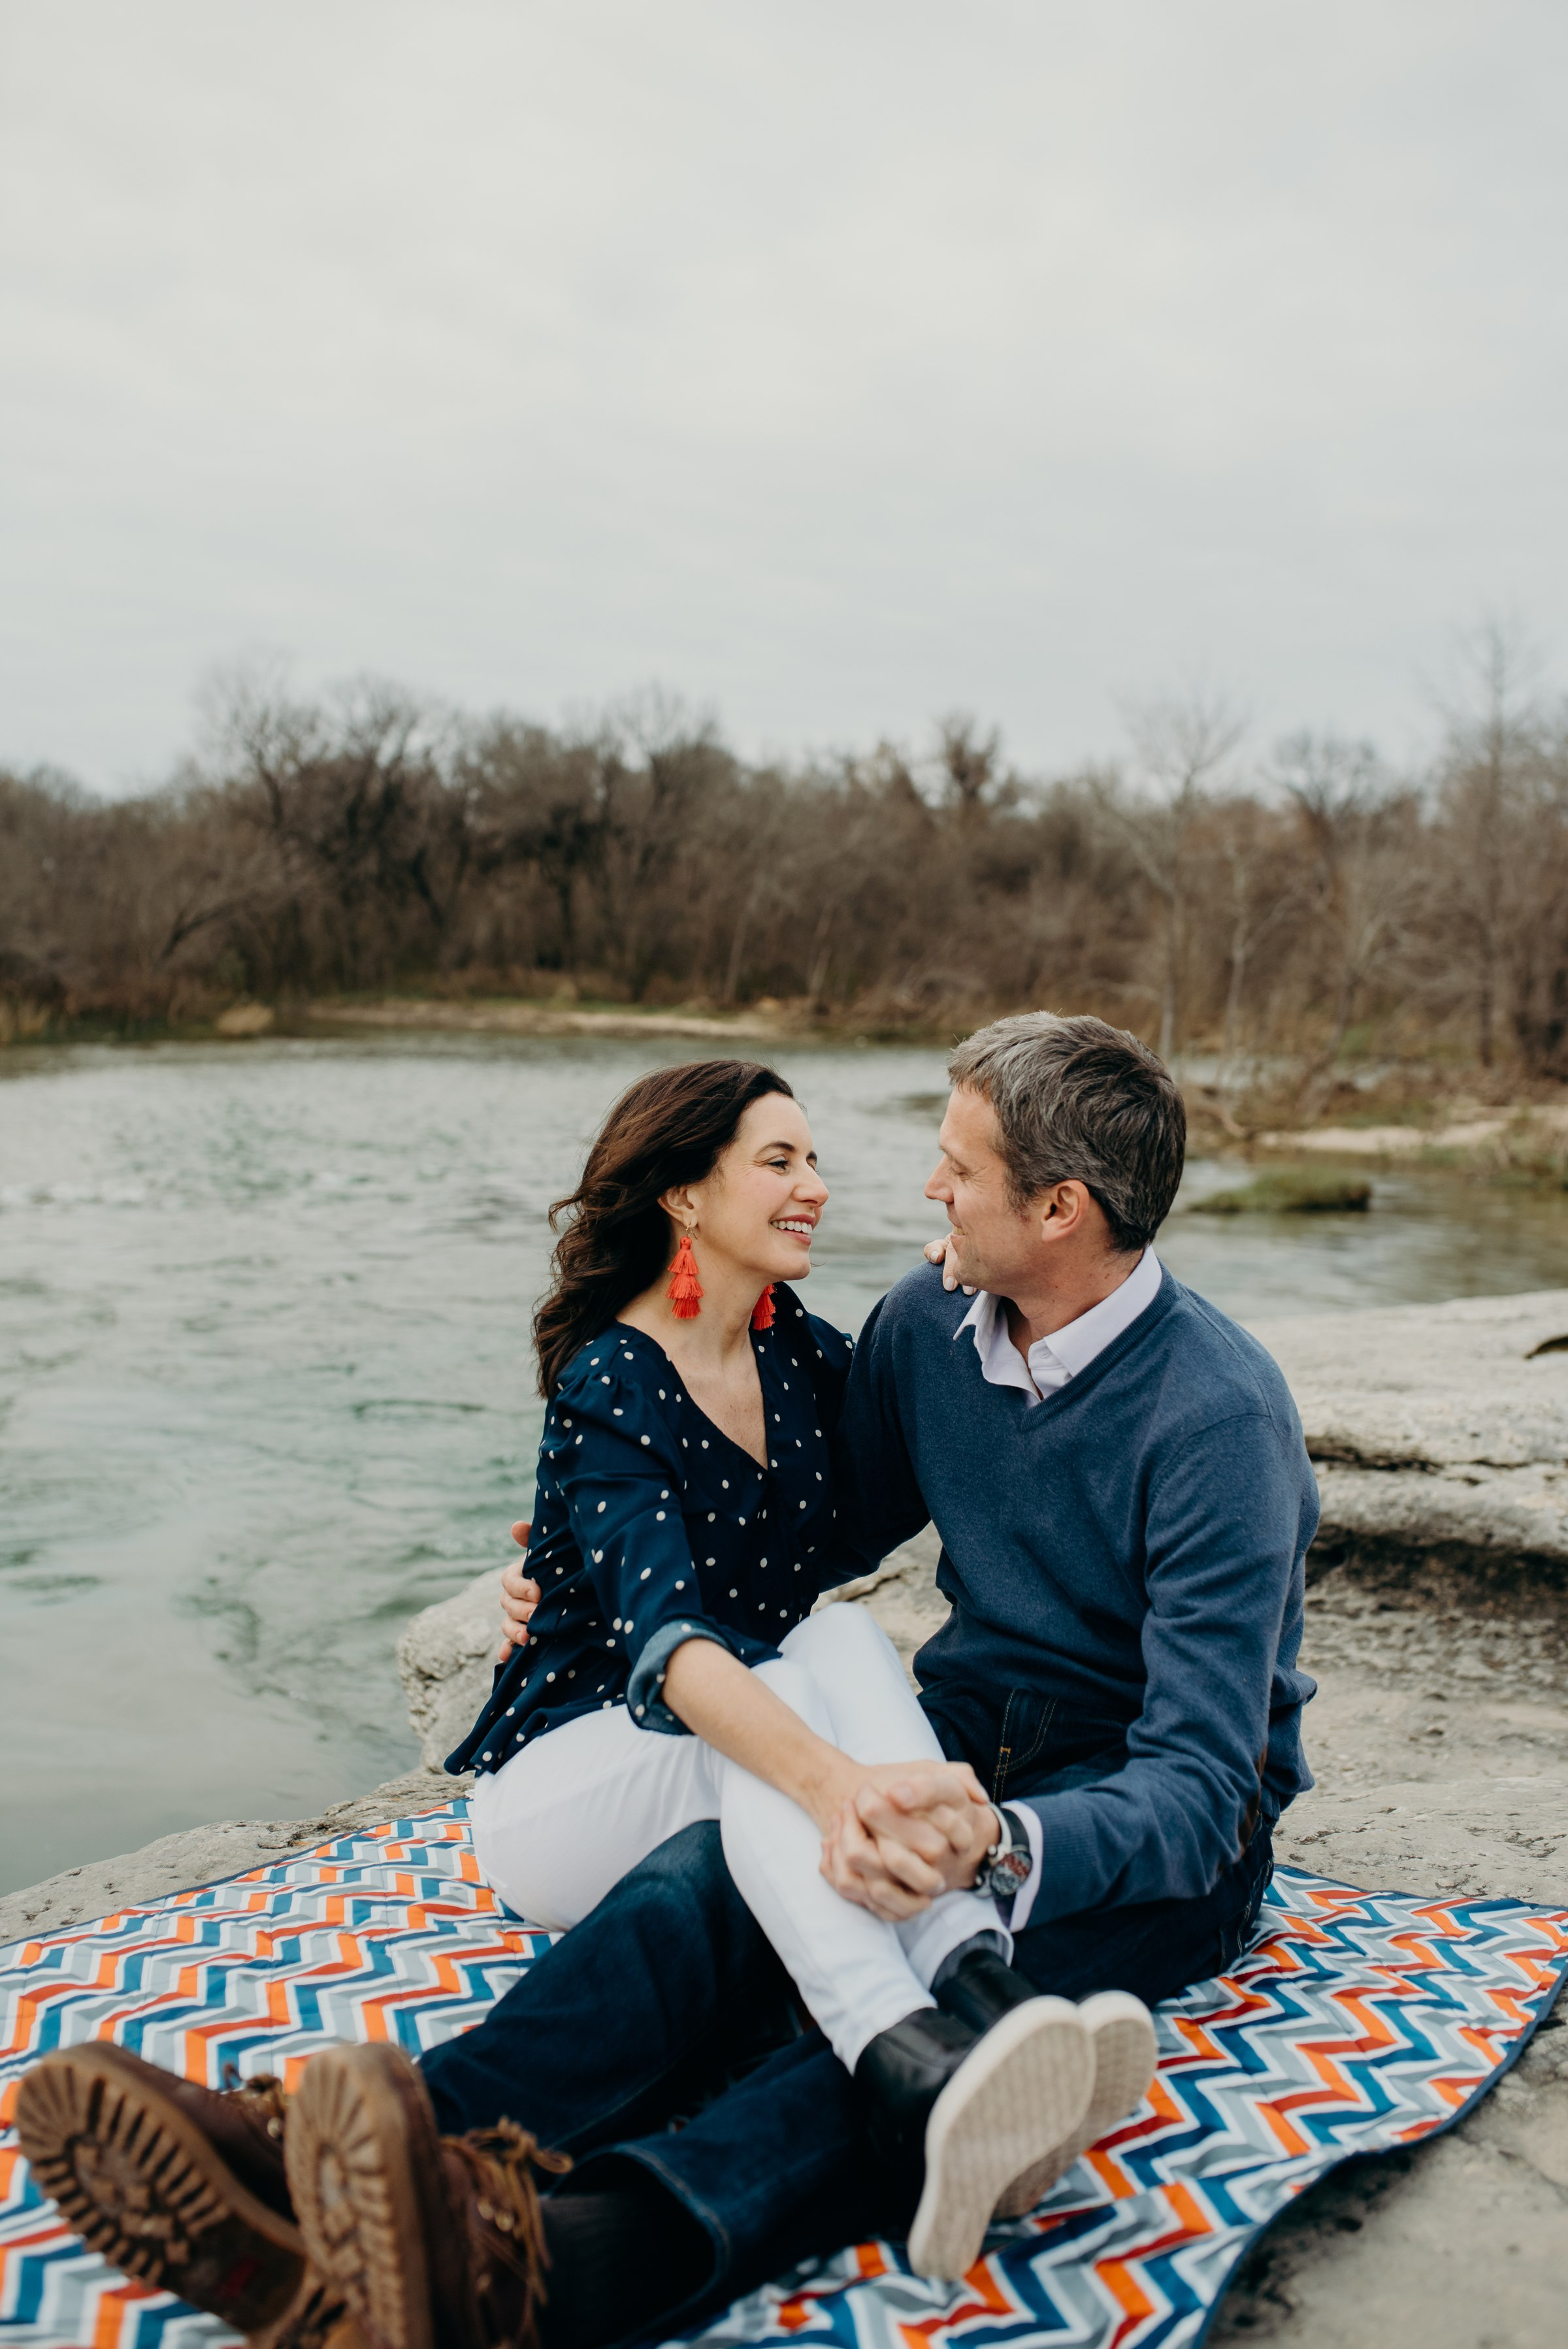 austin-mckinney-falls-engagement-photographer-elopement-prices-best-headshot-senior-adventurous-italy-minneapolis-texas-minnesota-dallas-houston-tulum-mexico_0021.jpg